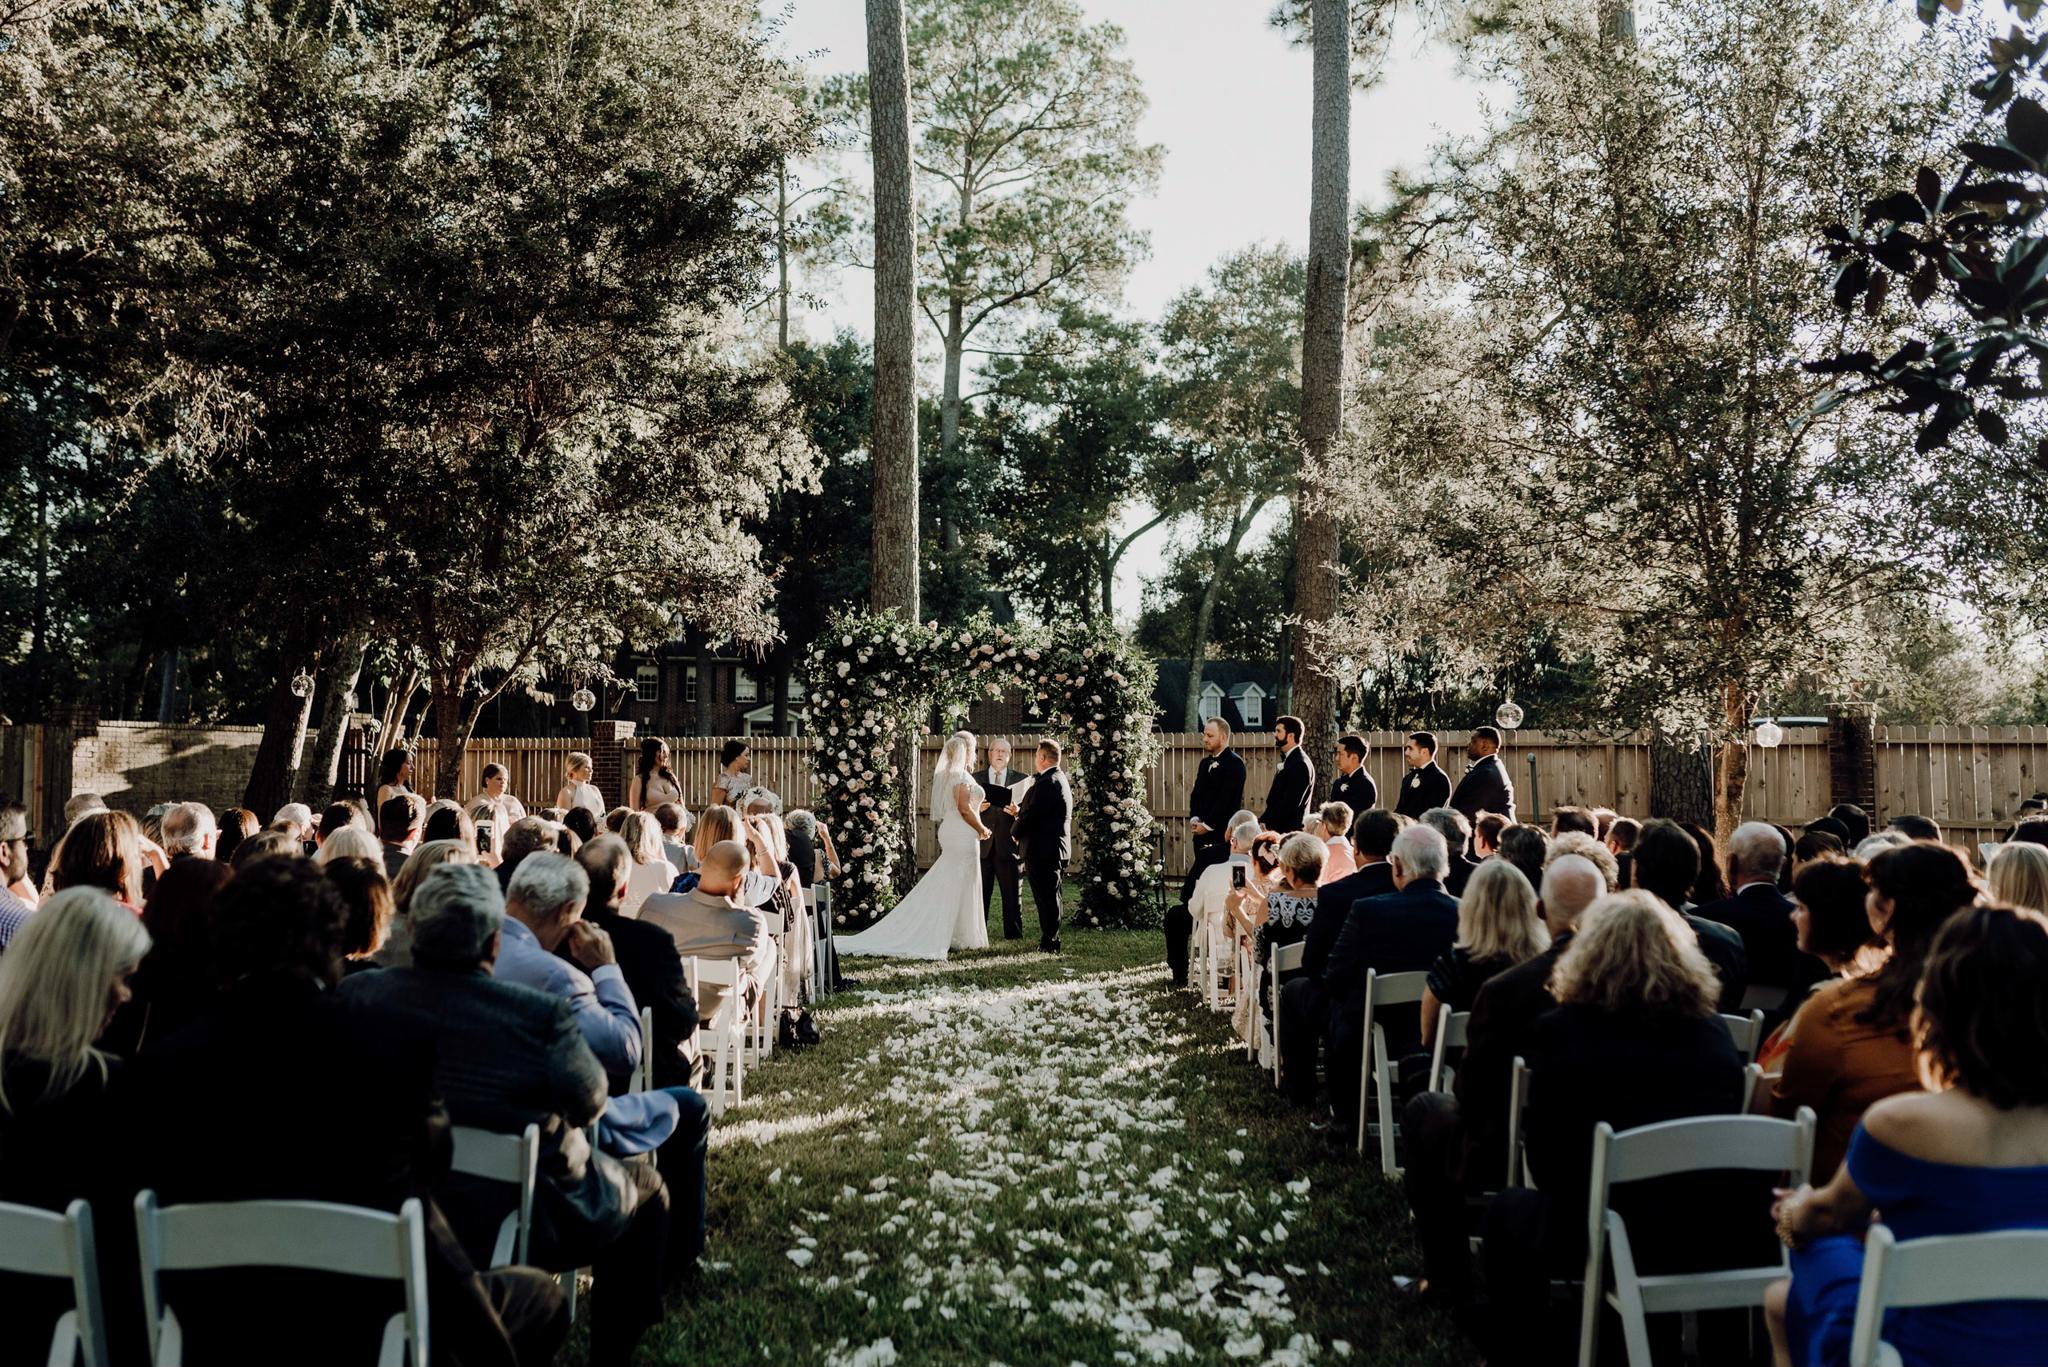 Houston Wedding Photographer-Intimate Texas Backyard Wedding- Houston Wedding Photographer -Kristen Giles Photography-45.jpg